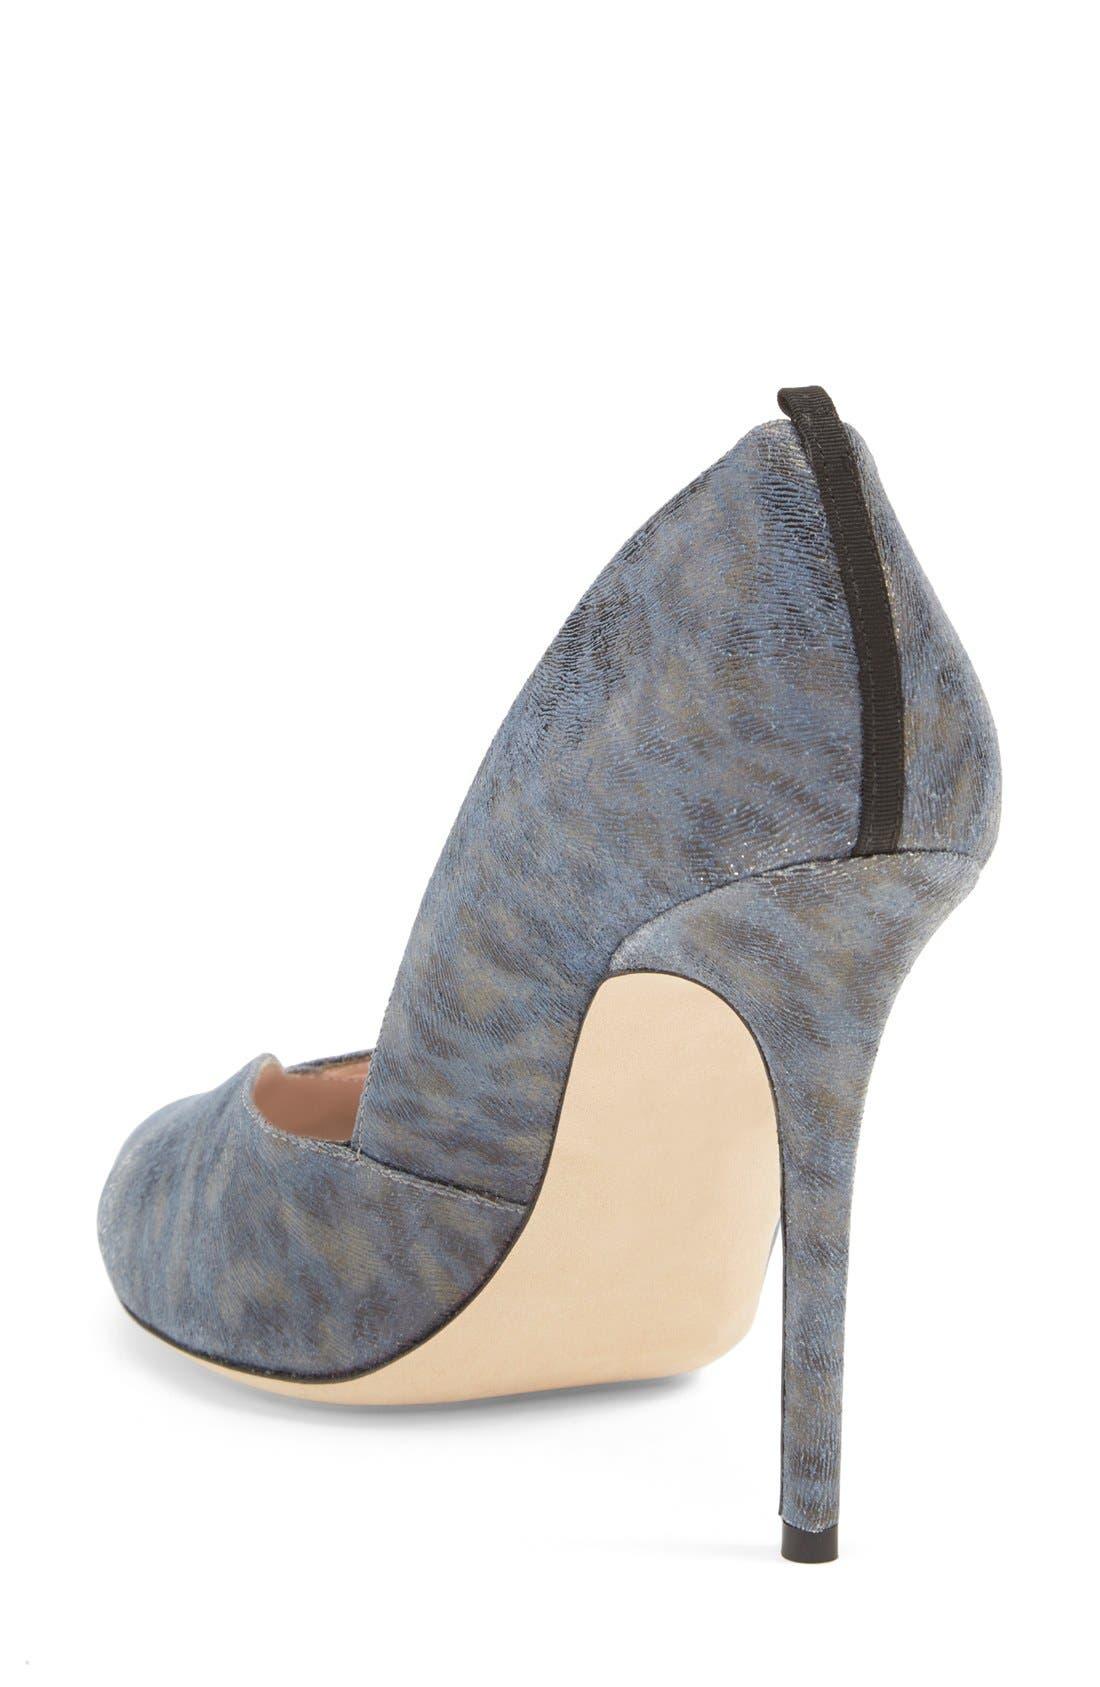 'Naomi' Peep Toe Pump,                             Alternate thumbnail 2, color,                             Blue Leopard Leather